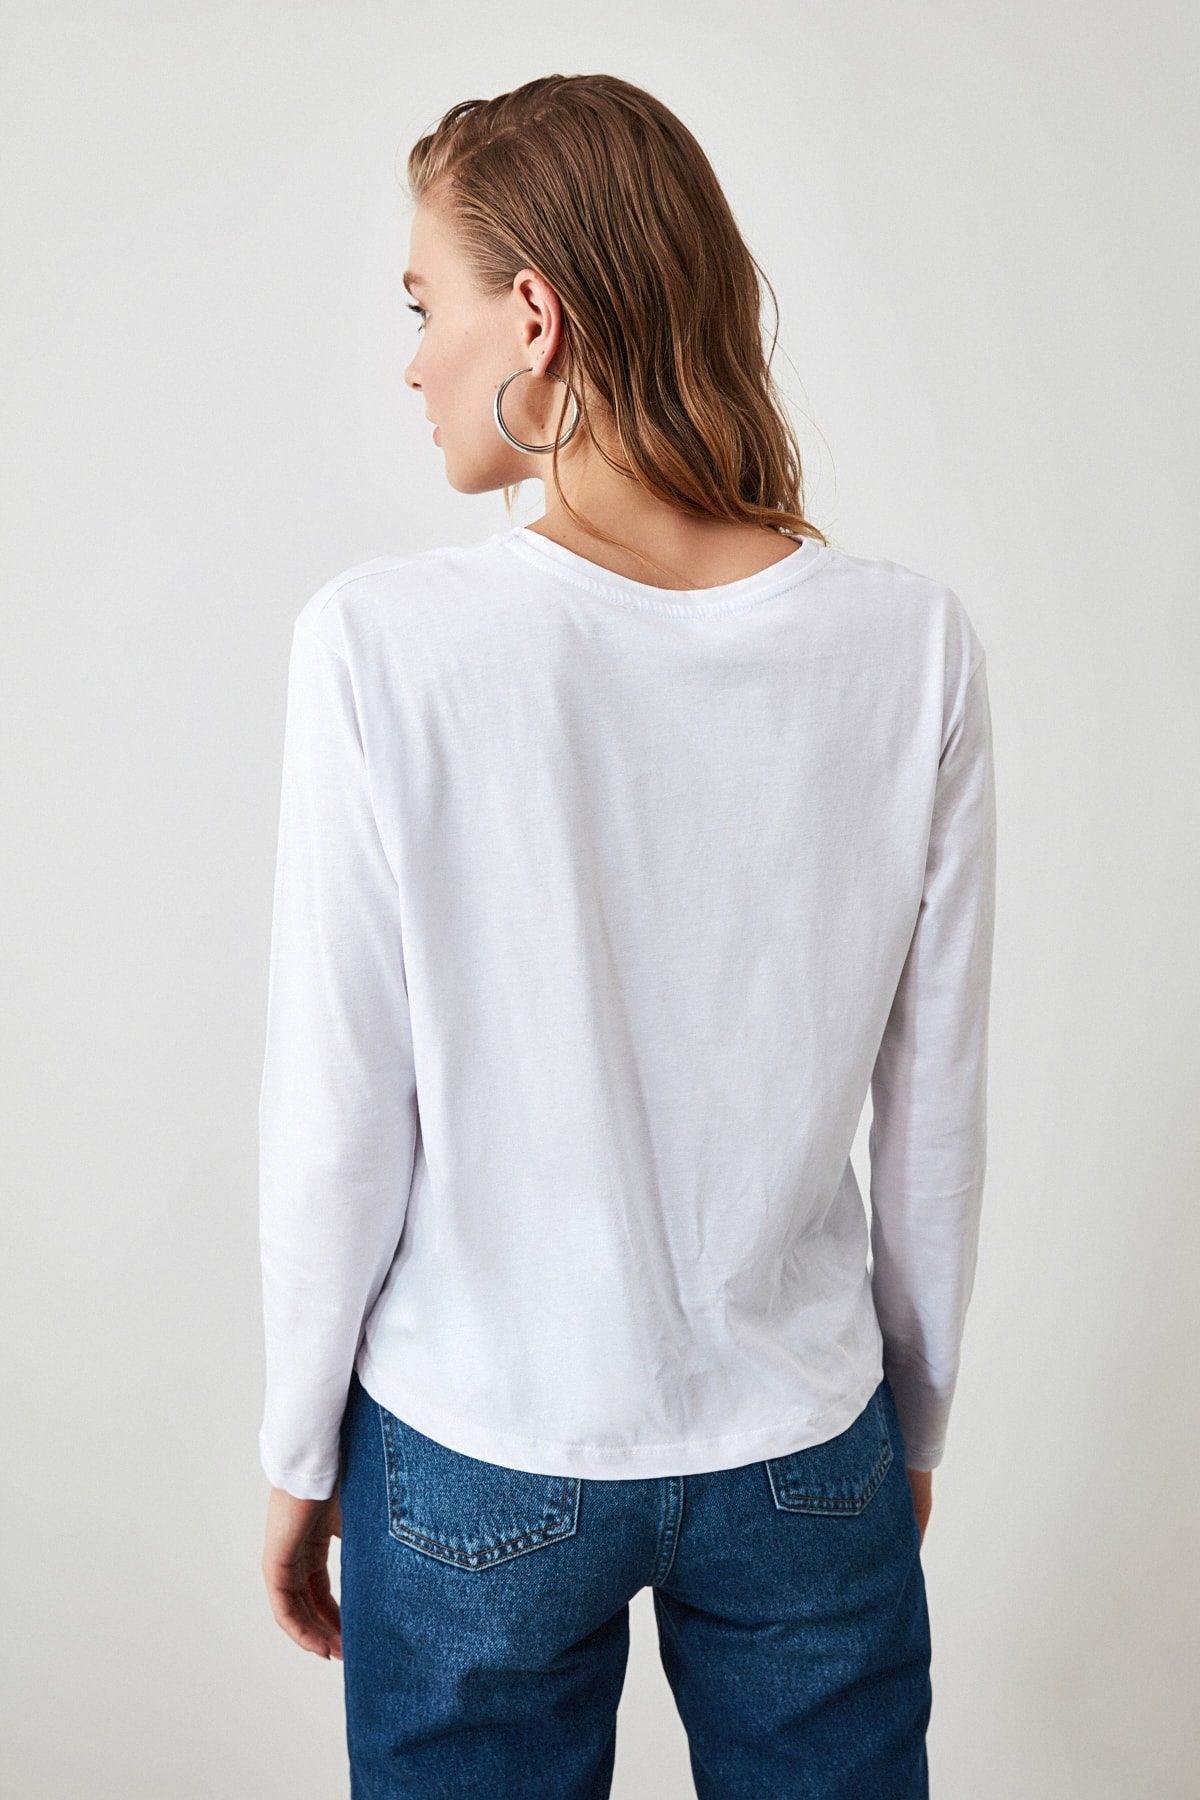 Signos del Zodiaco | Camiseta de Mujer de Manga Larga Blanca/MultiColor CAMISETAS MANGA LARGA CAMISETAS DE MUJER